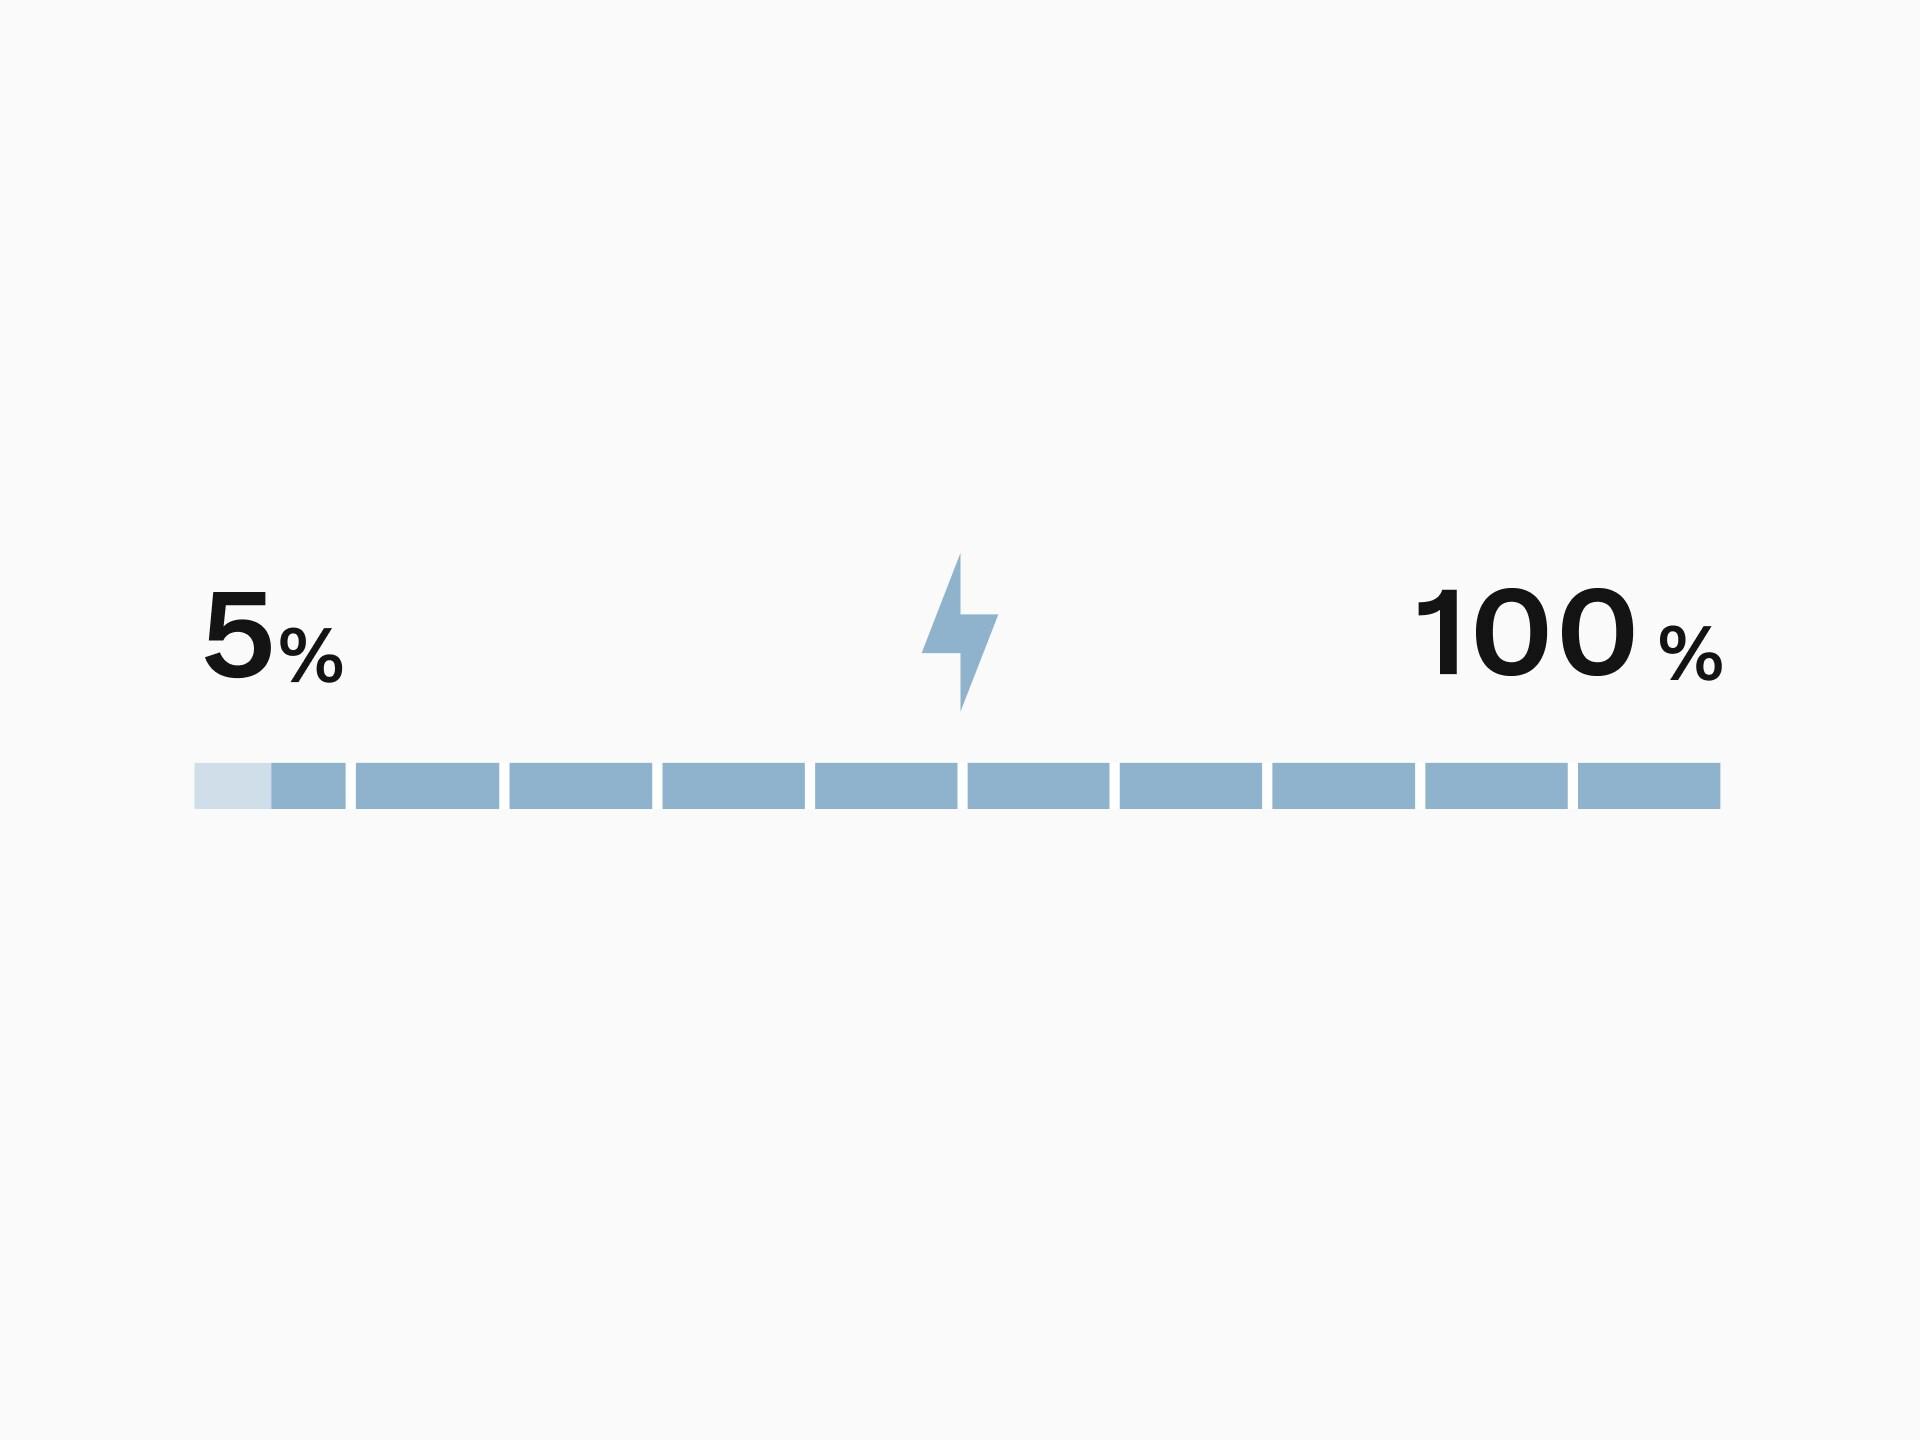 Søjlediagram over batteriopladningsprocent, fremhævet fra 5 % til 100 % for at indikere det ideelle driftsområde for et plug-in hybridbatteri.